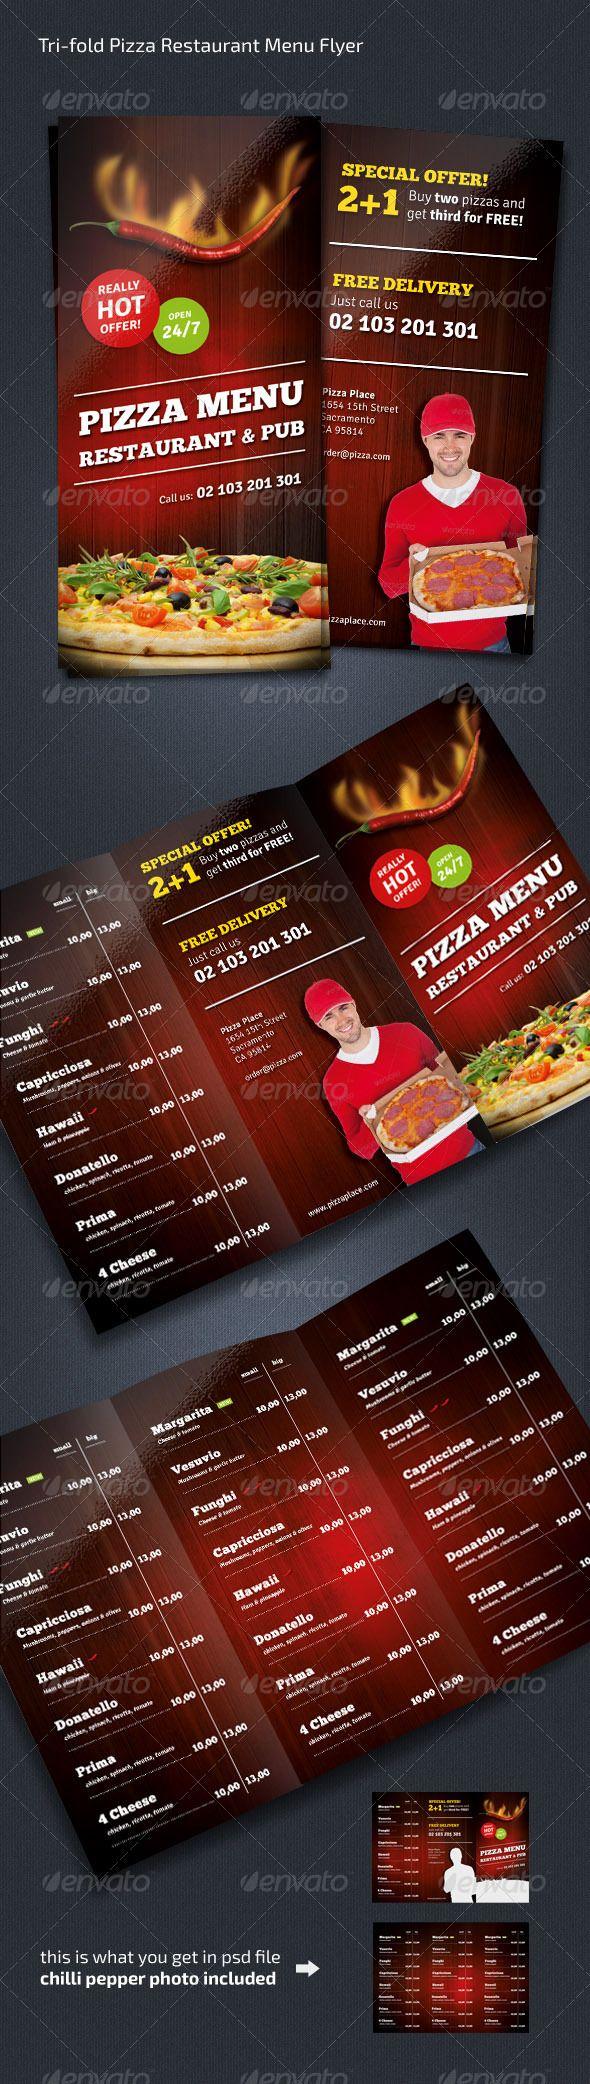 Pizza Restaurant Menu Flyer (Trifold)